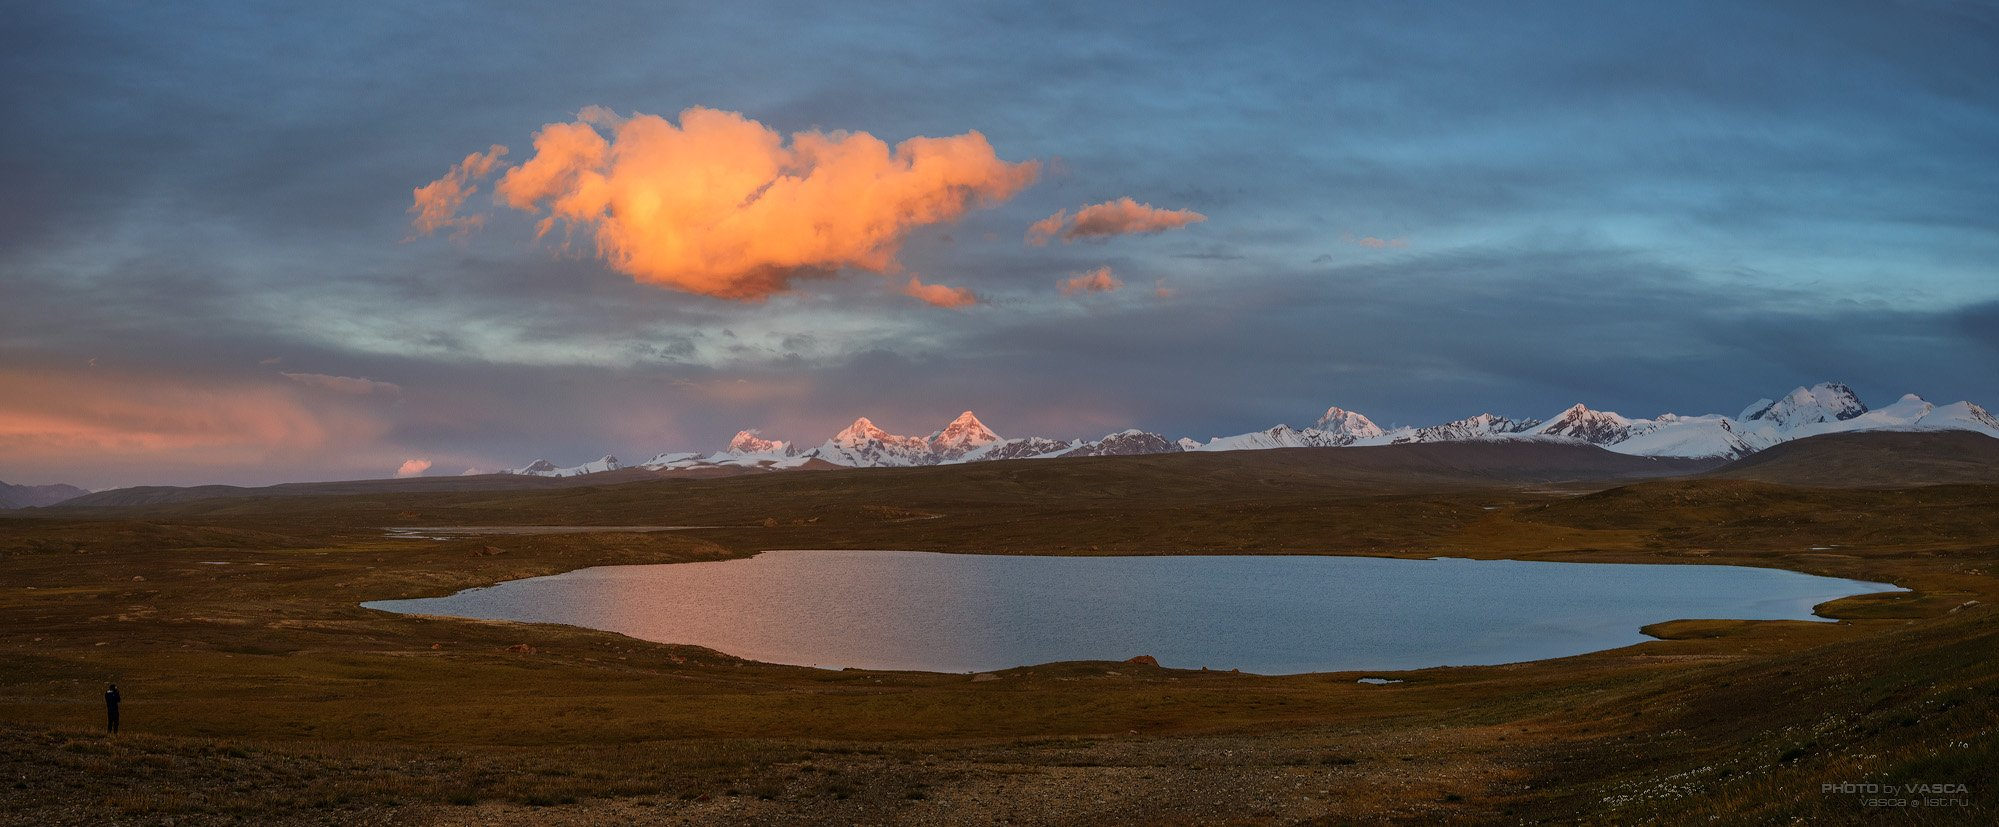 Киргизия, горы, закат, облако, озеро, Данкова пик, Vasca